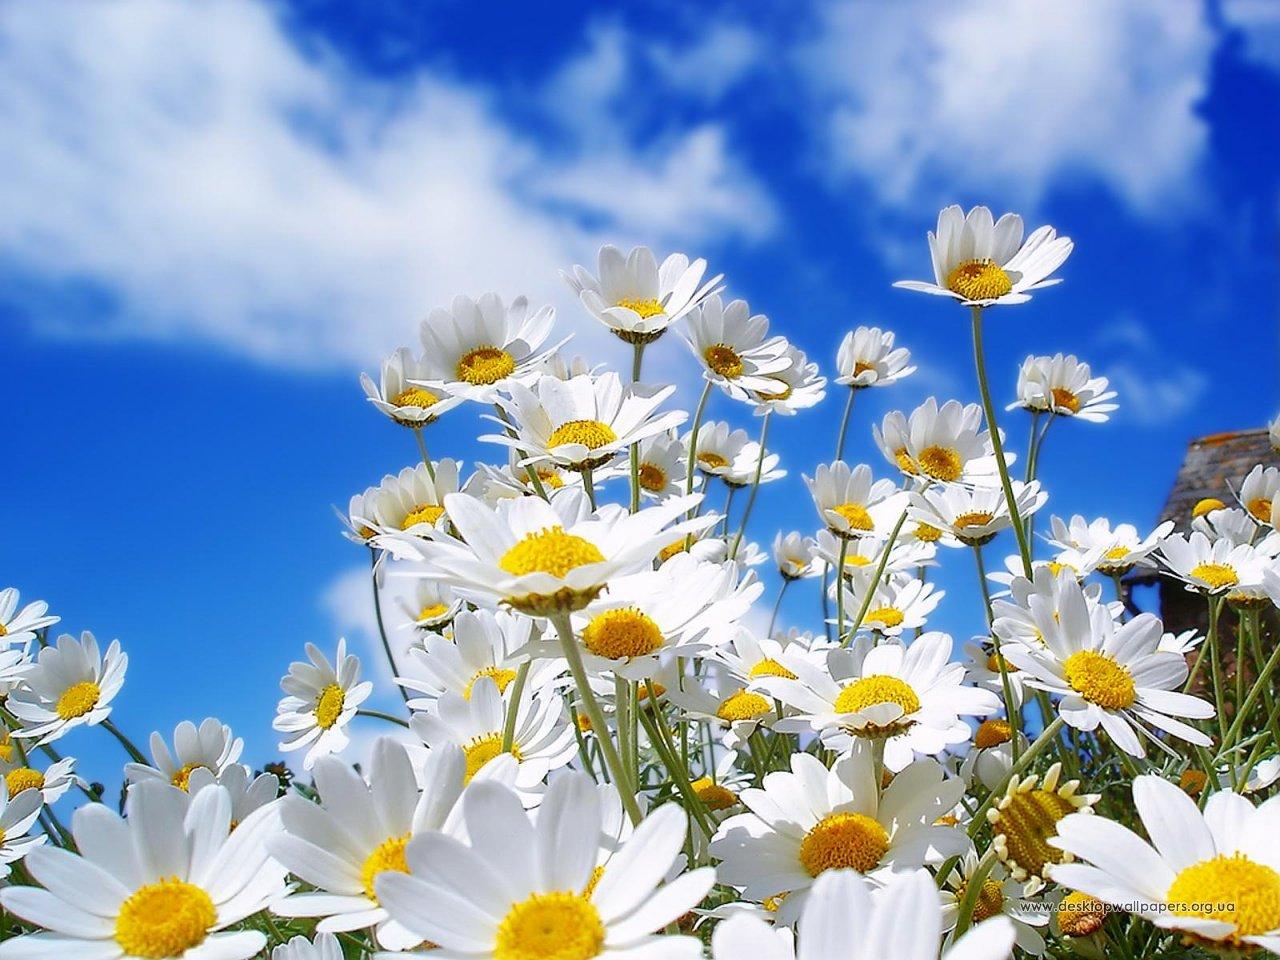 Шпалери spring daisy переглянути